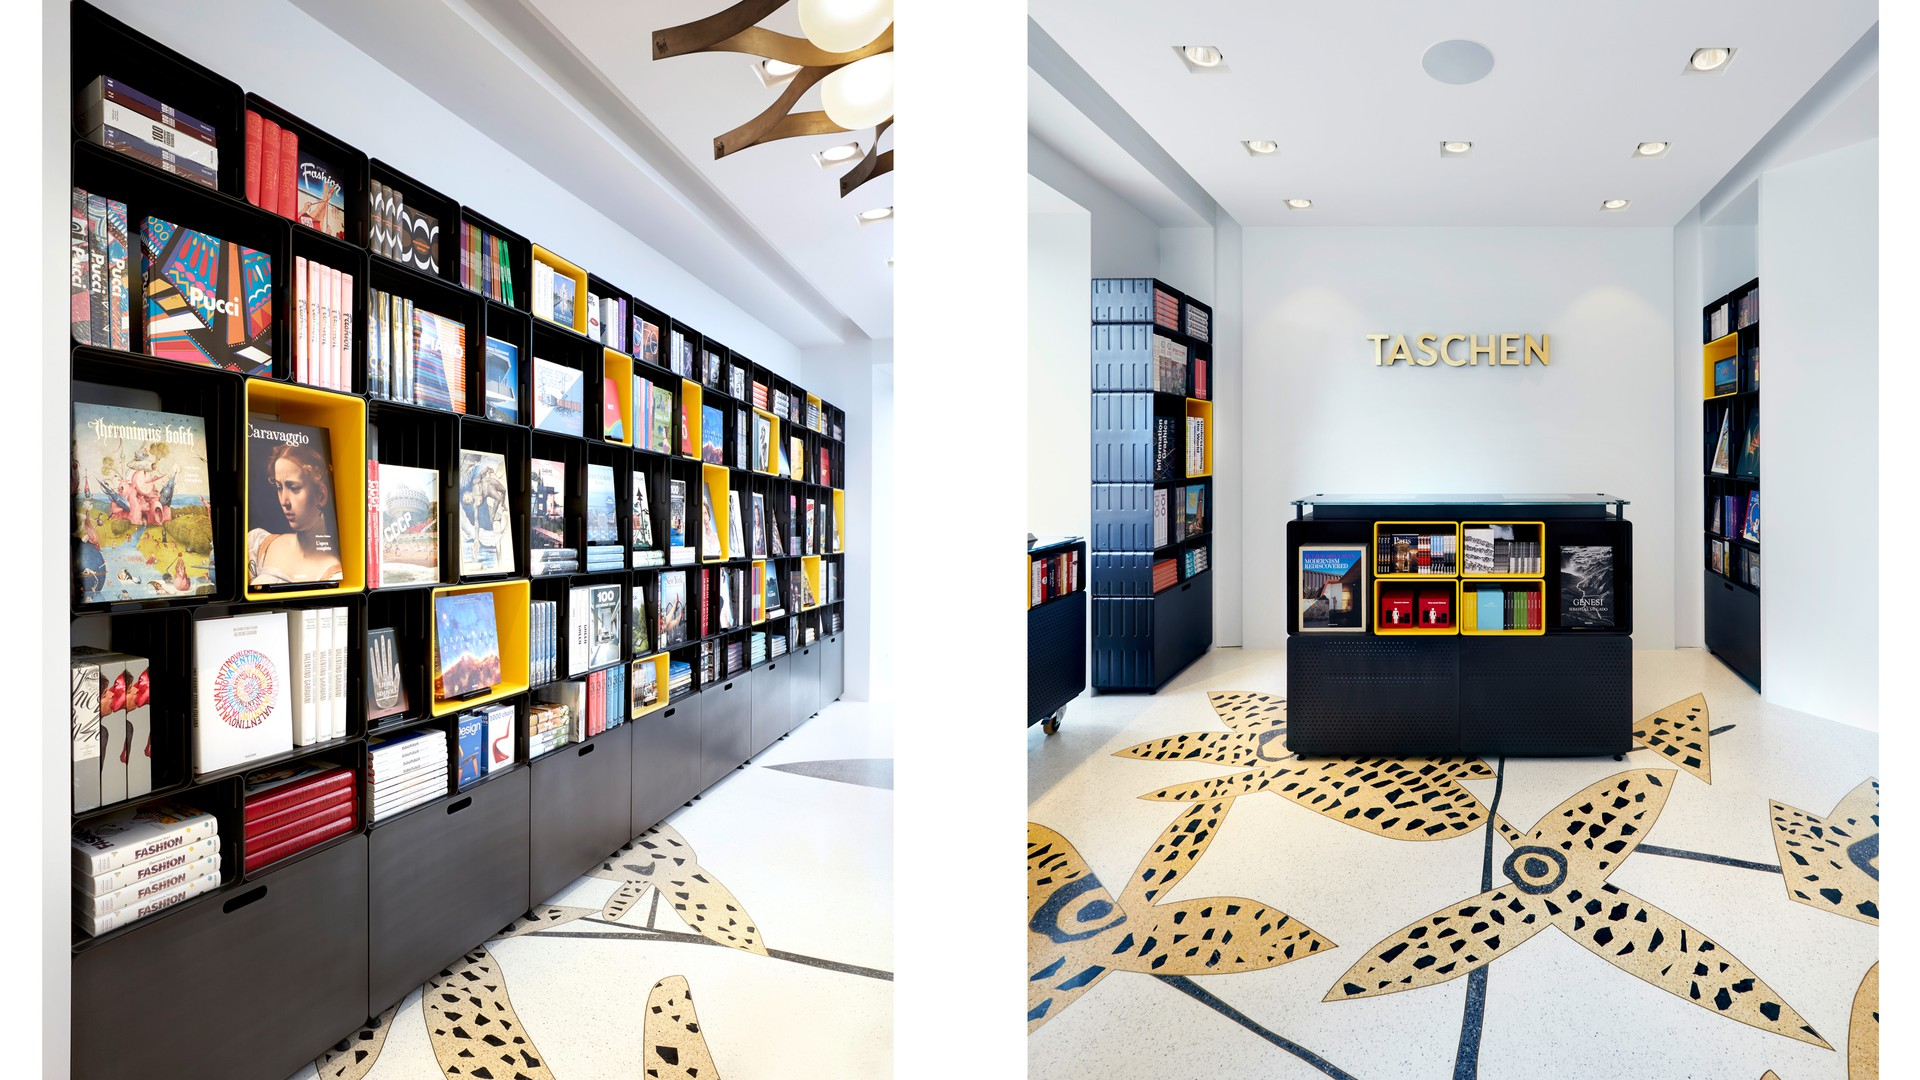 taschen milan store furniture display systems marc newson ltd. Black Bedroom Furniture Sets. Home Design Ideas